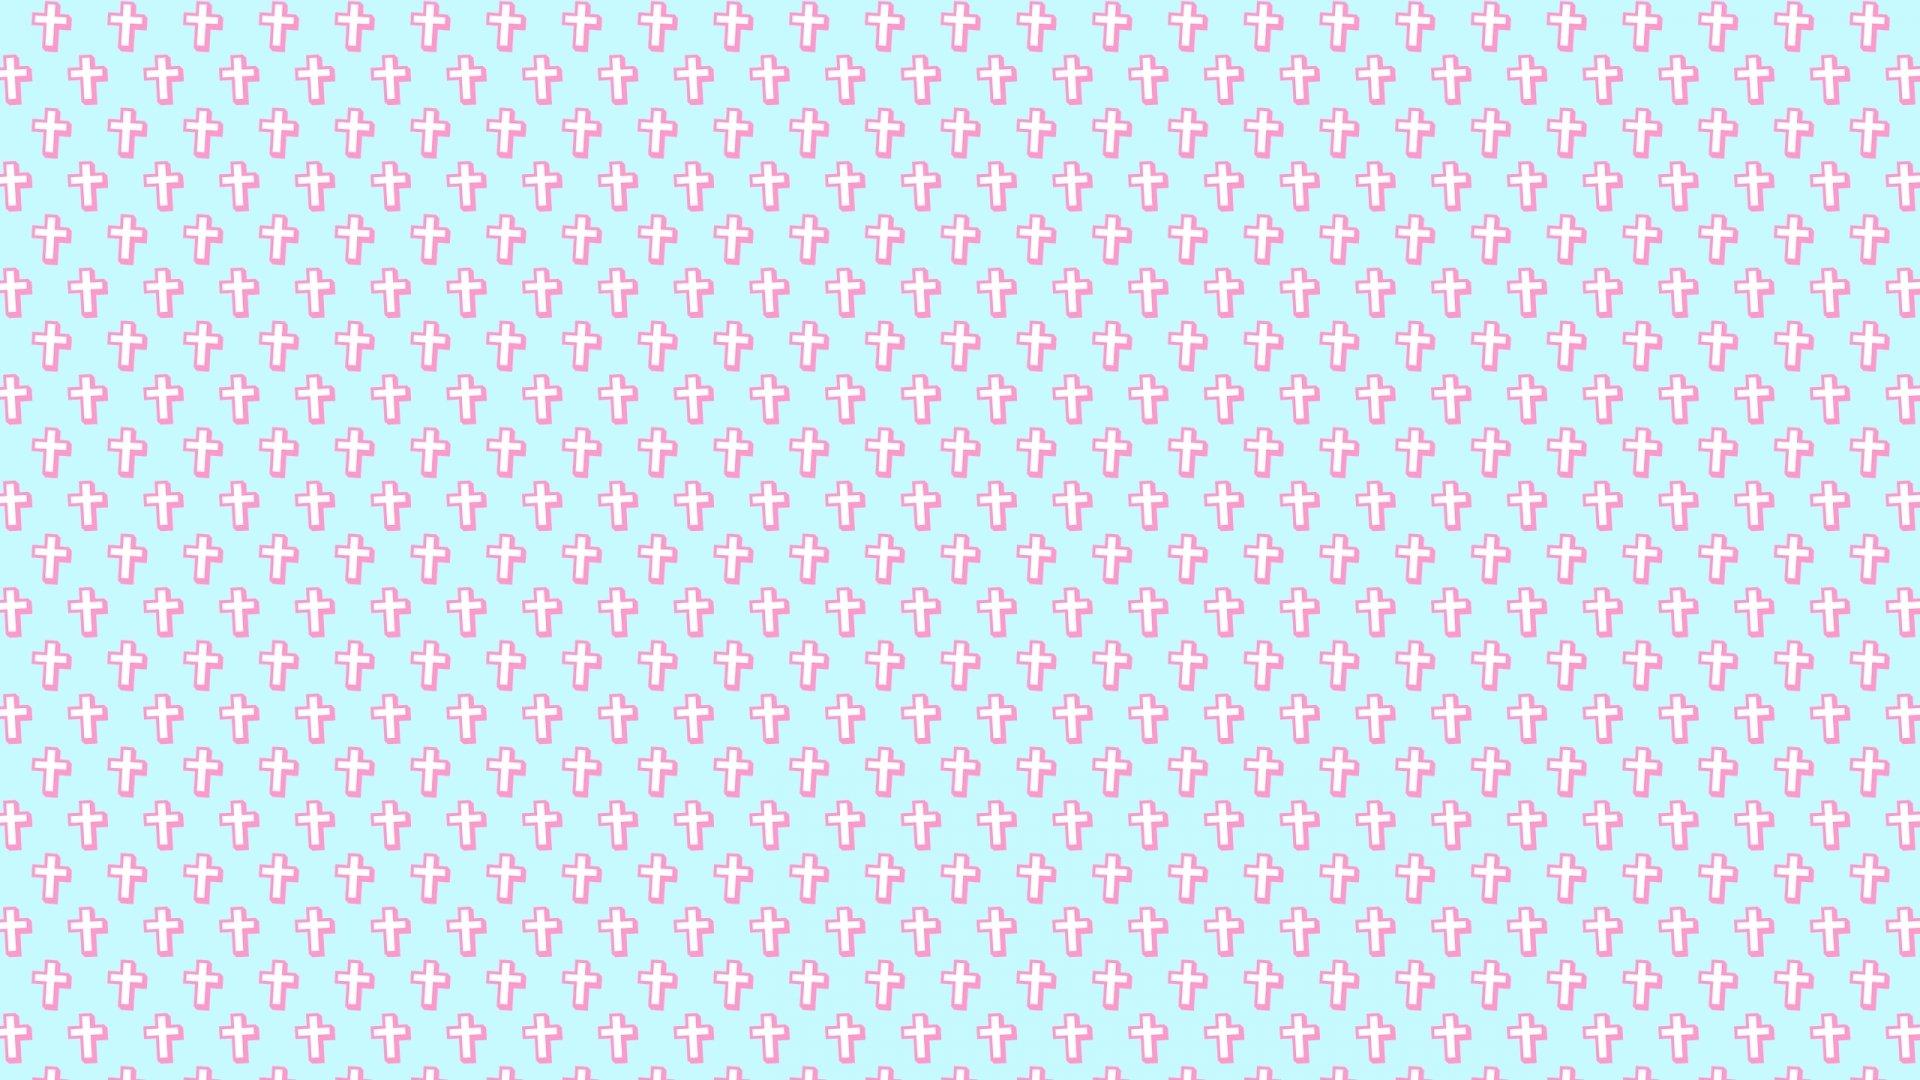 Pastel Kawaii Wallpaper Full HD